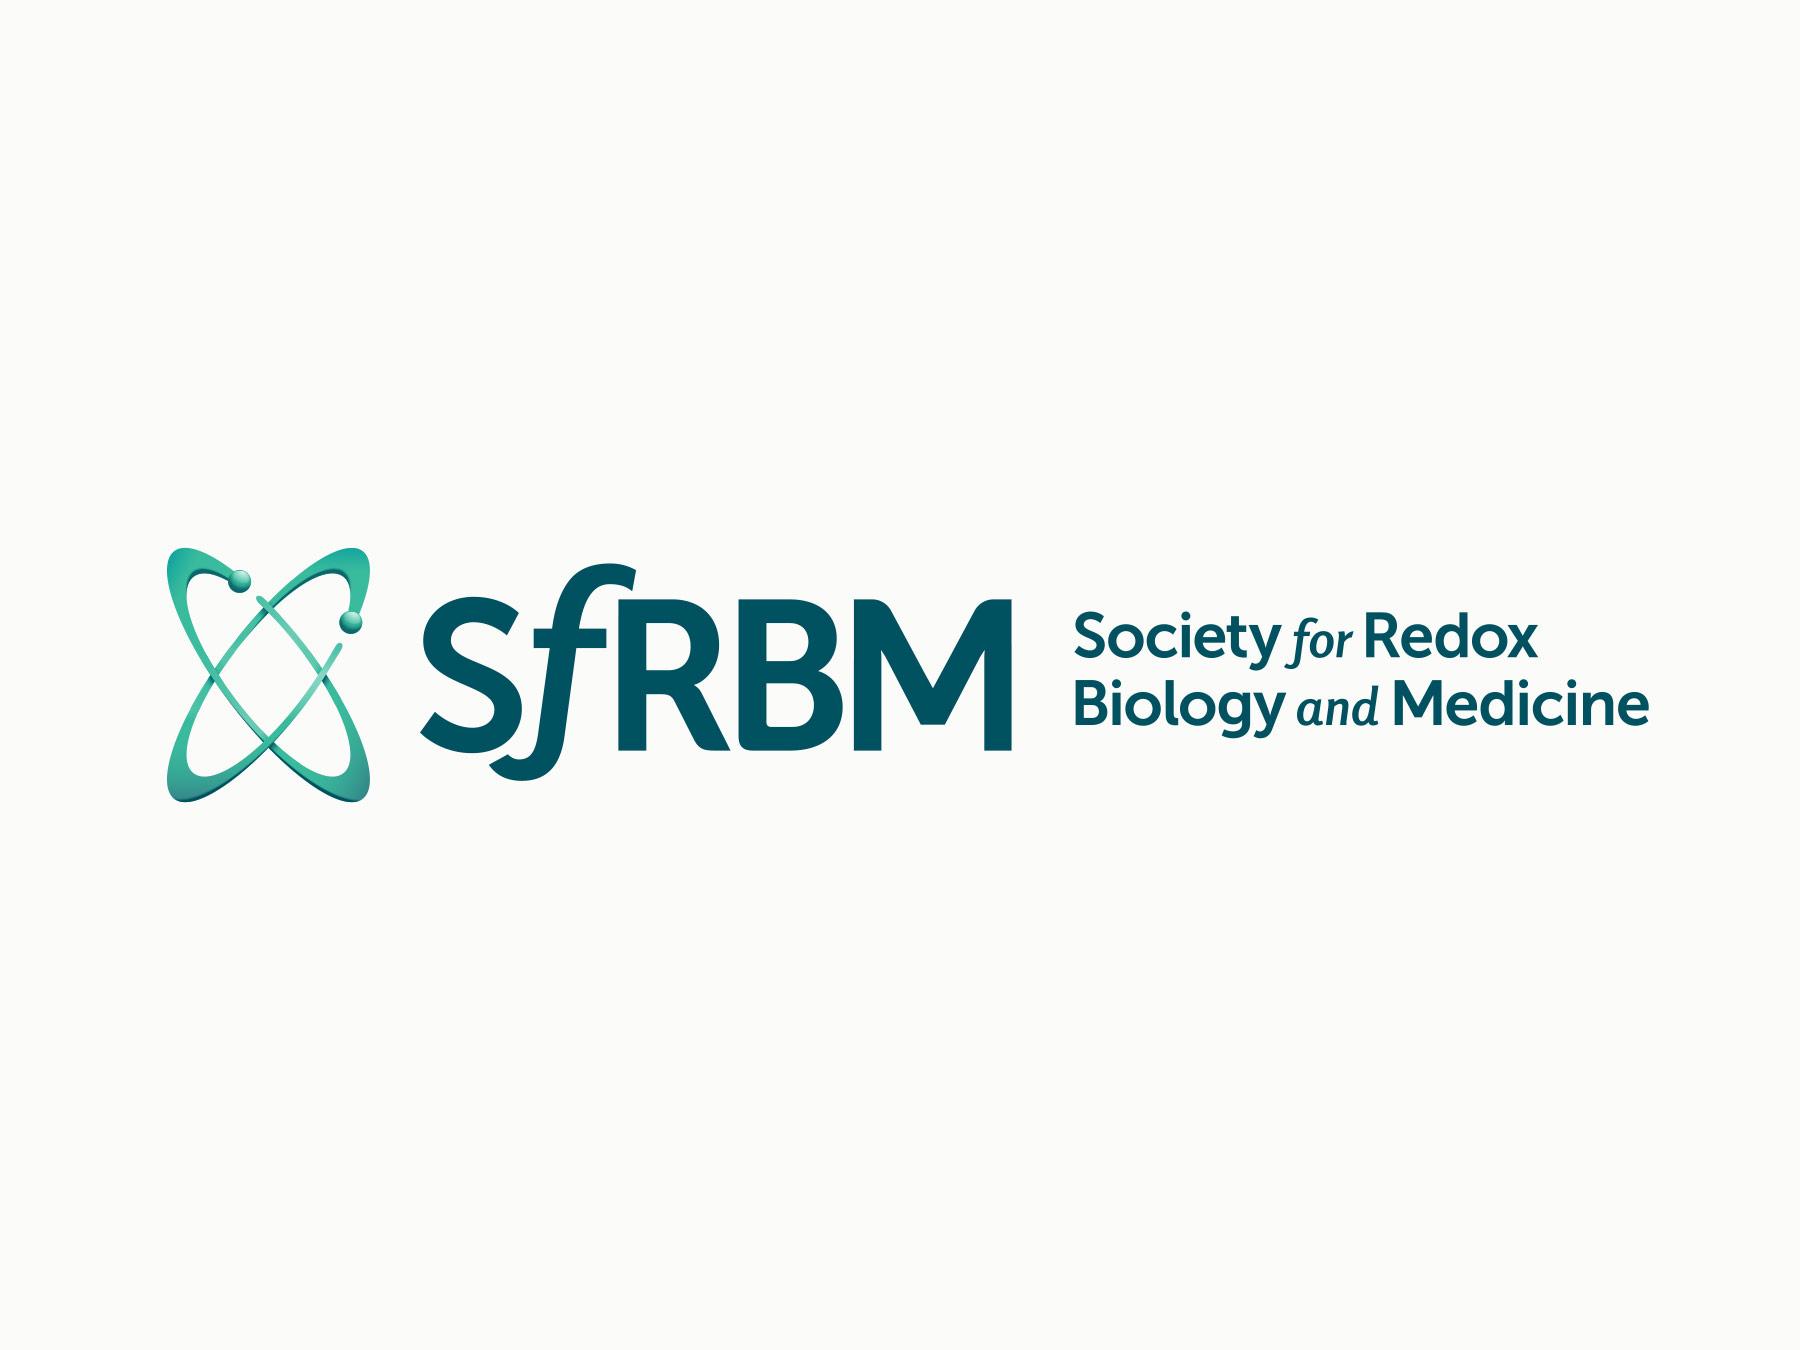 SfRBM brandmark